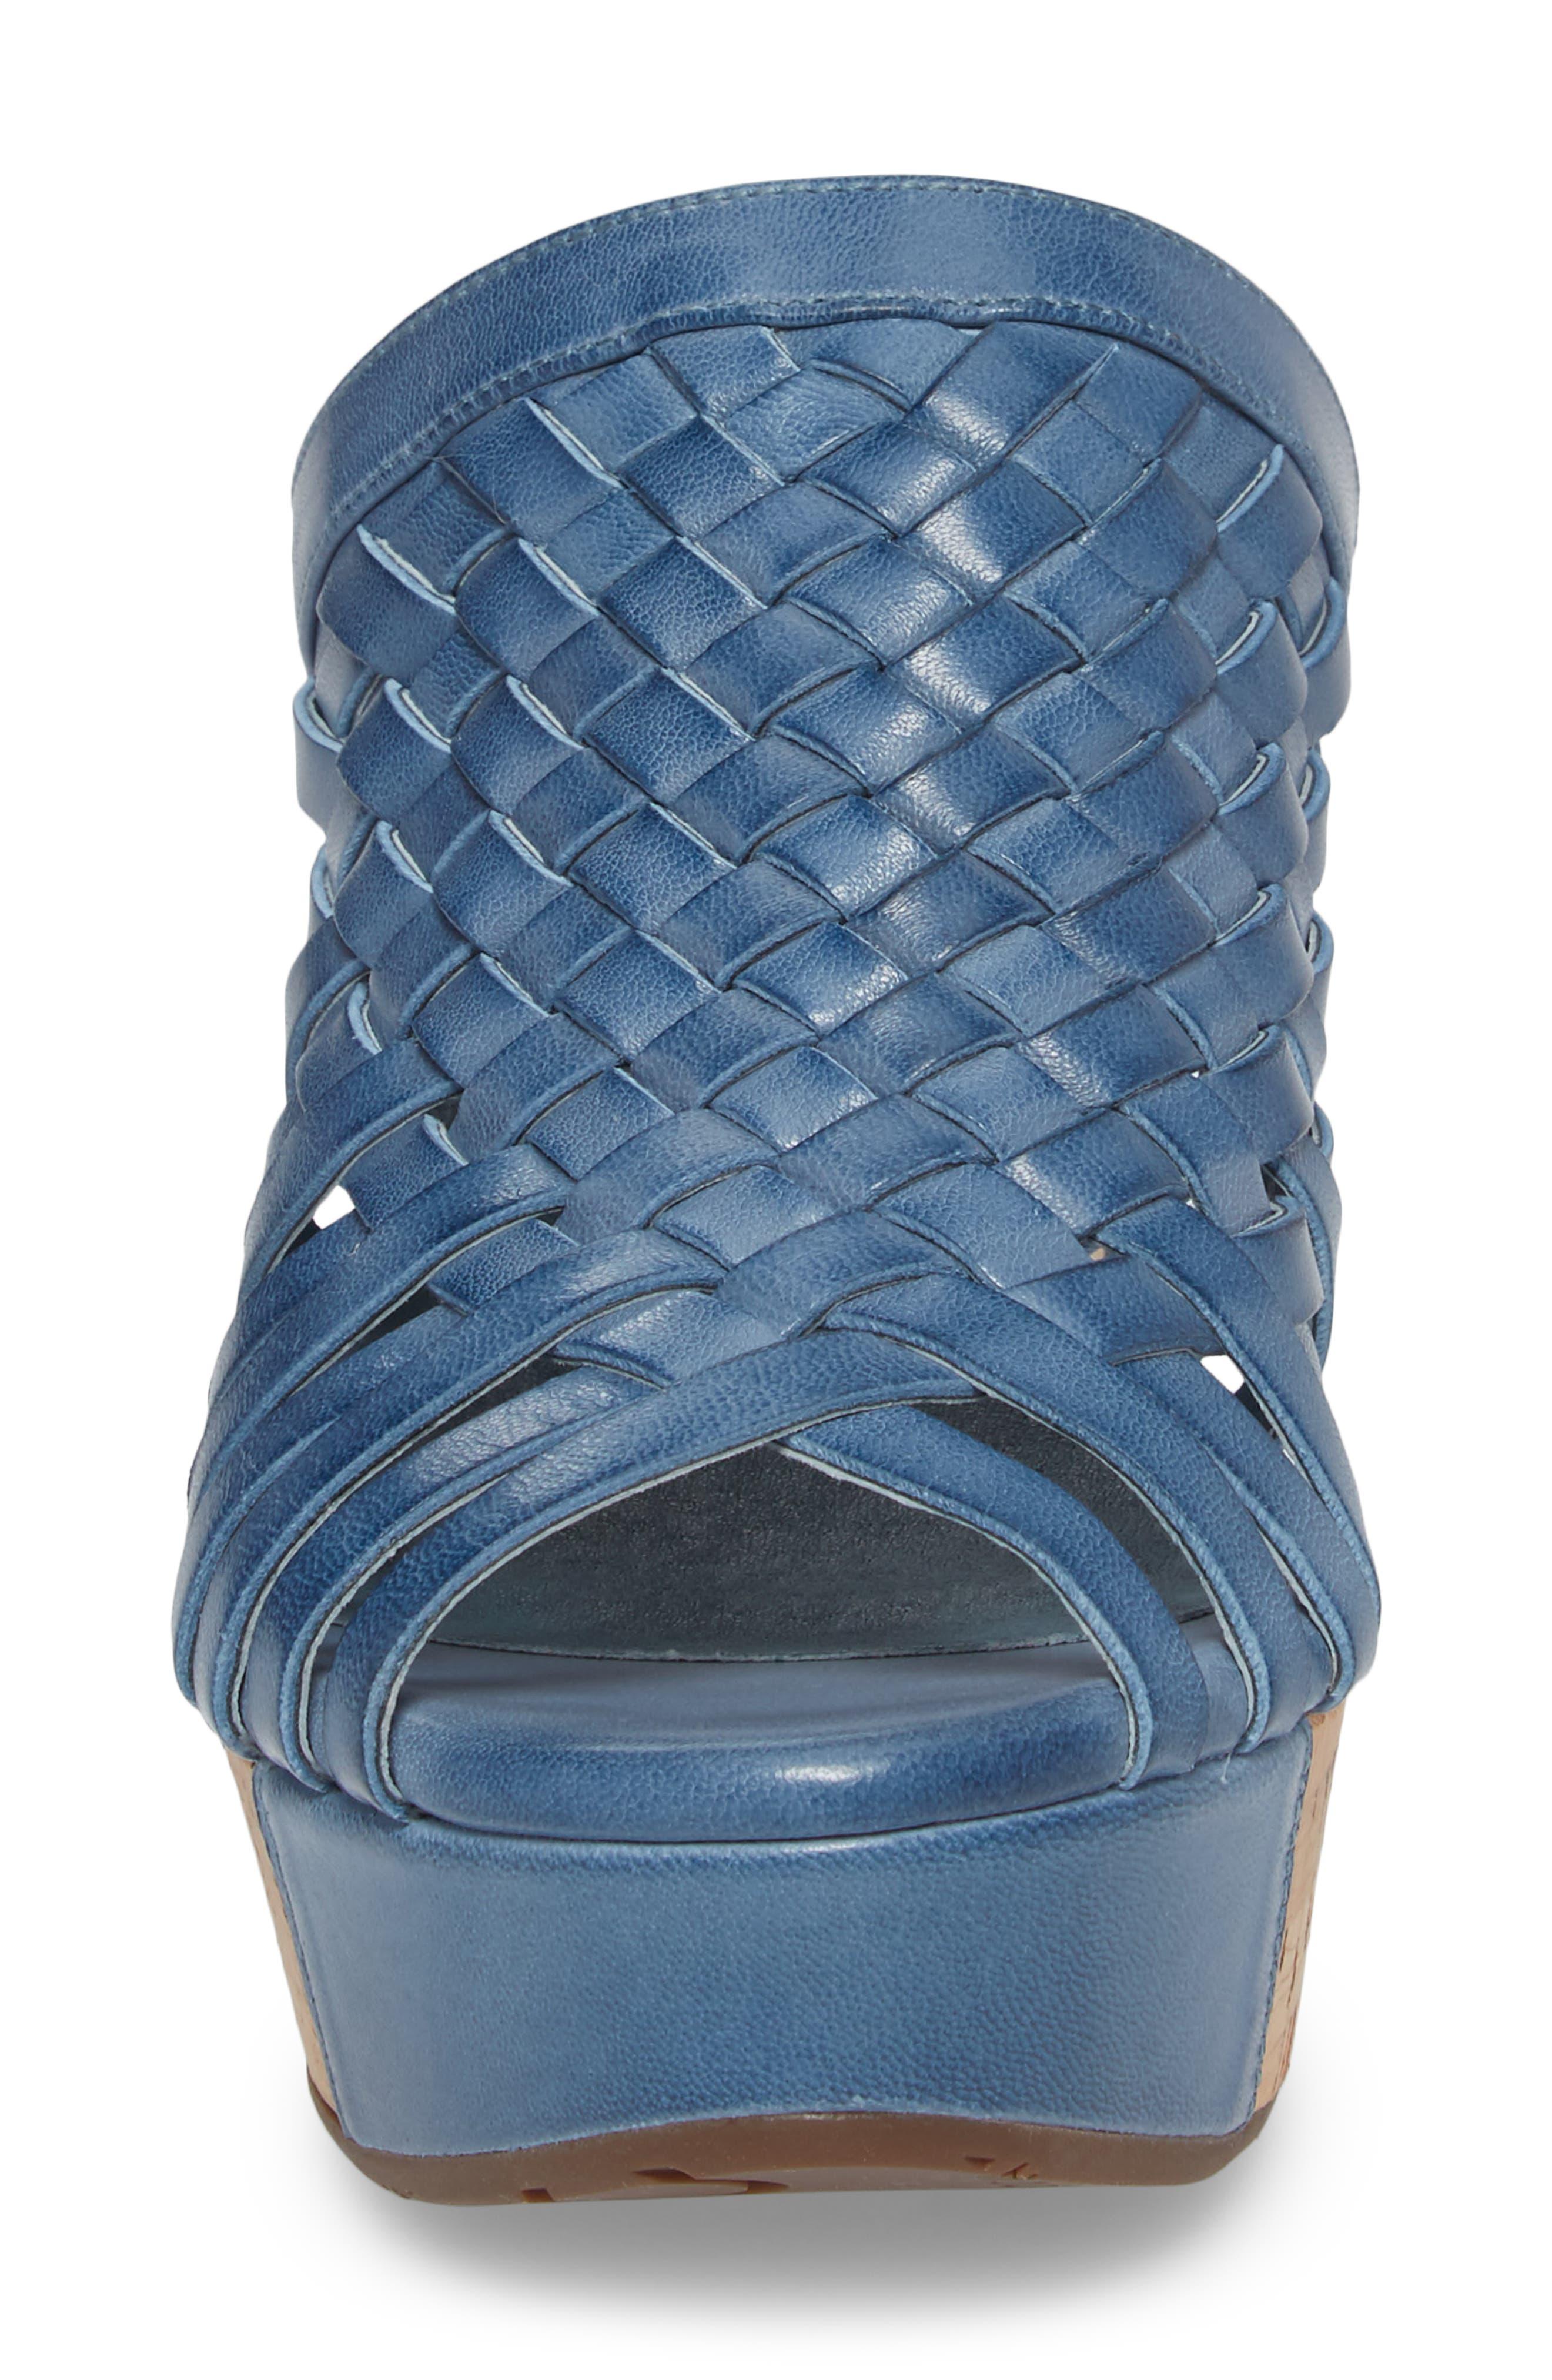 Walda Platform Wedge Sandal,                             Alternate thumbnail 12, color,